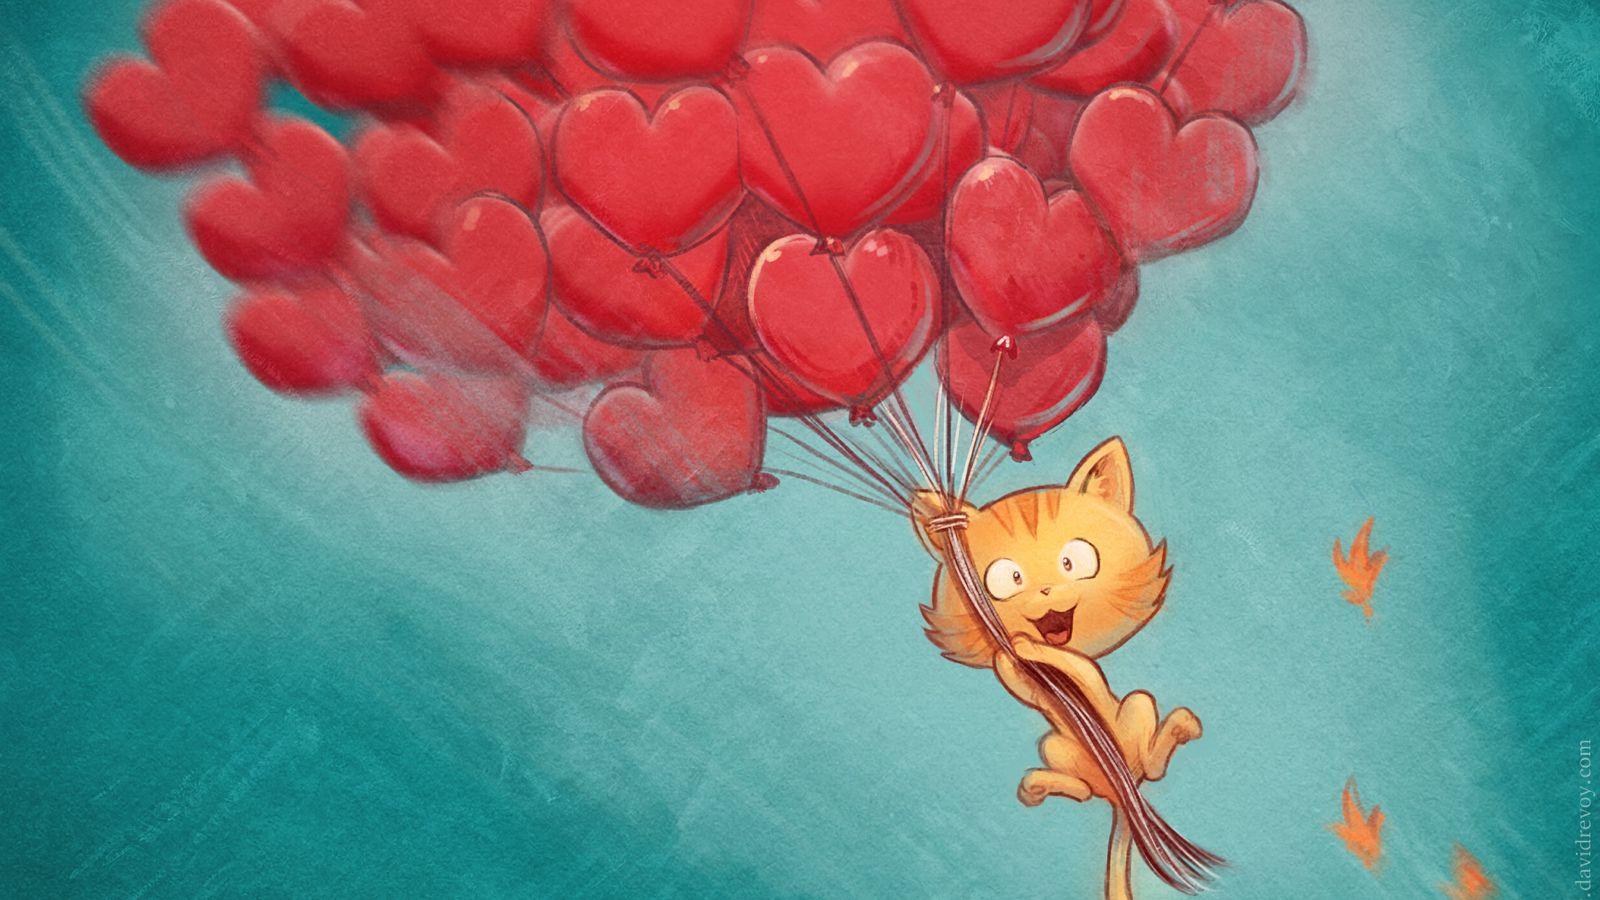 1600x900 Wallpaper cat, balloons, hearts, flight, sky, art